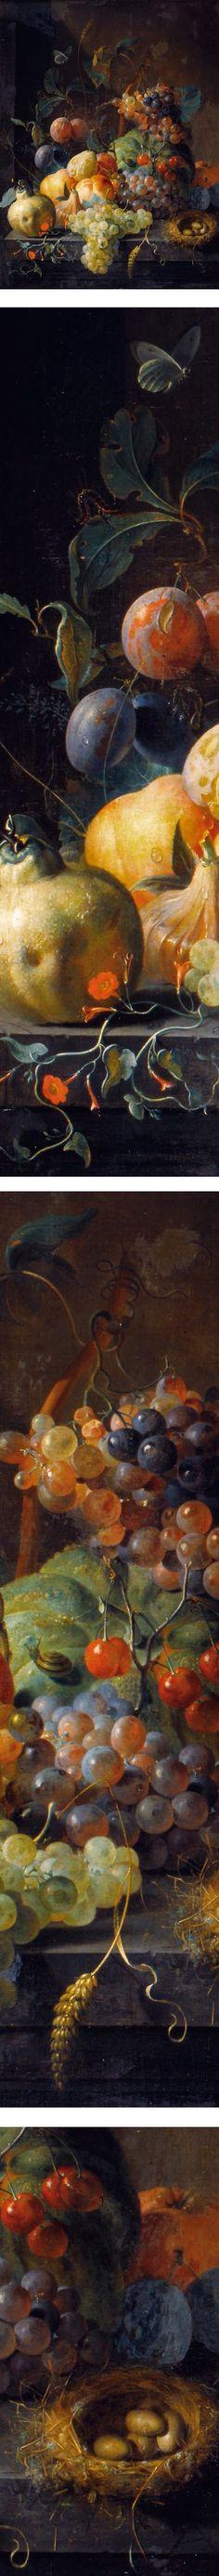 Still Life with Fruit (1720), Coenraet Roepel (1678 – 1748)